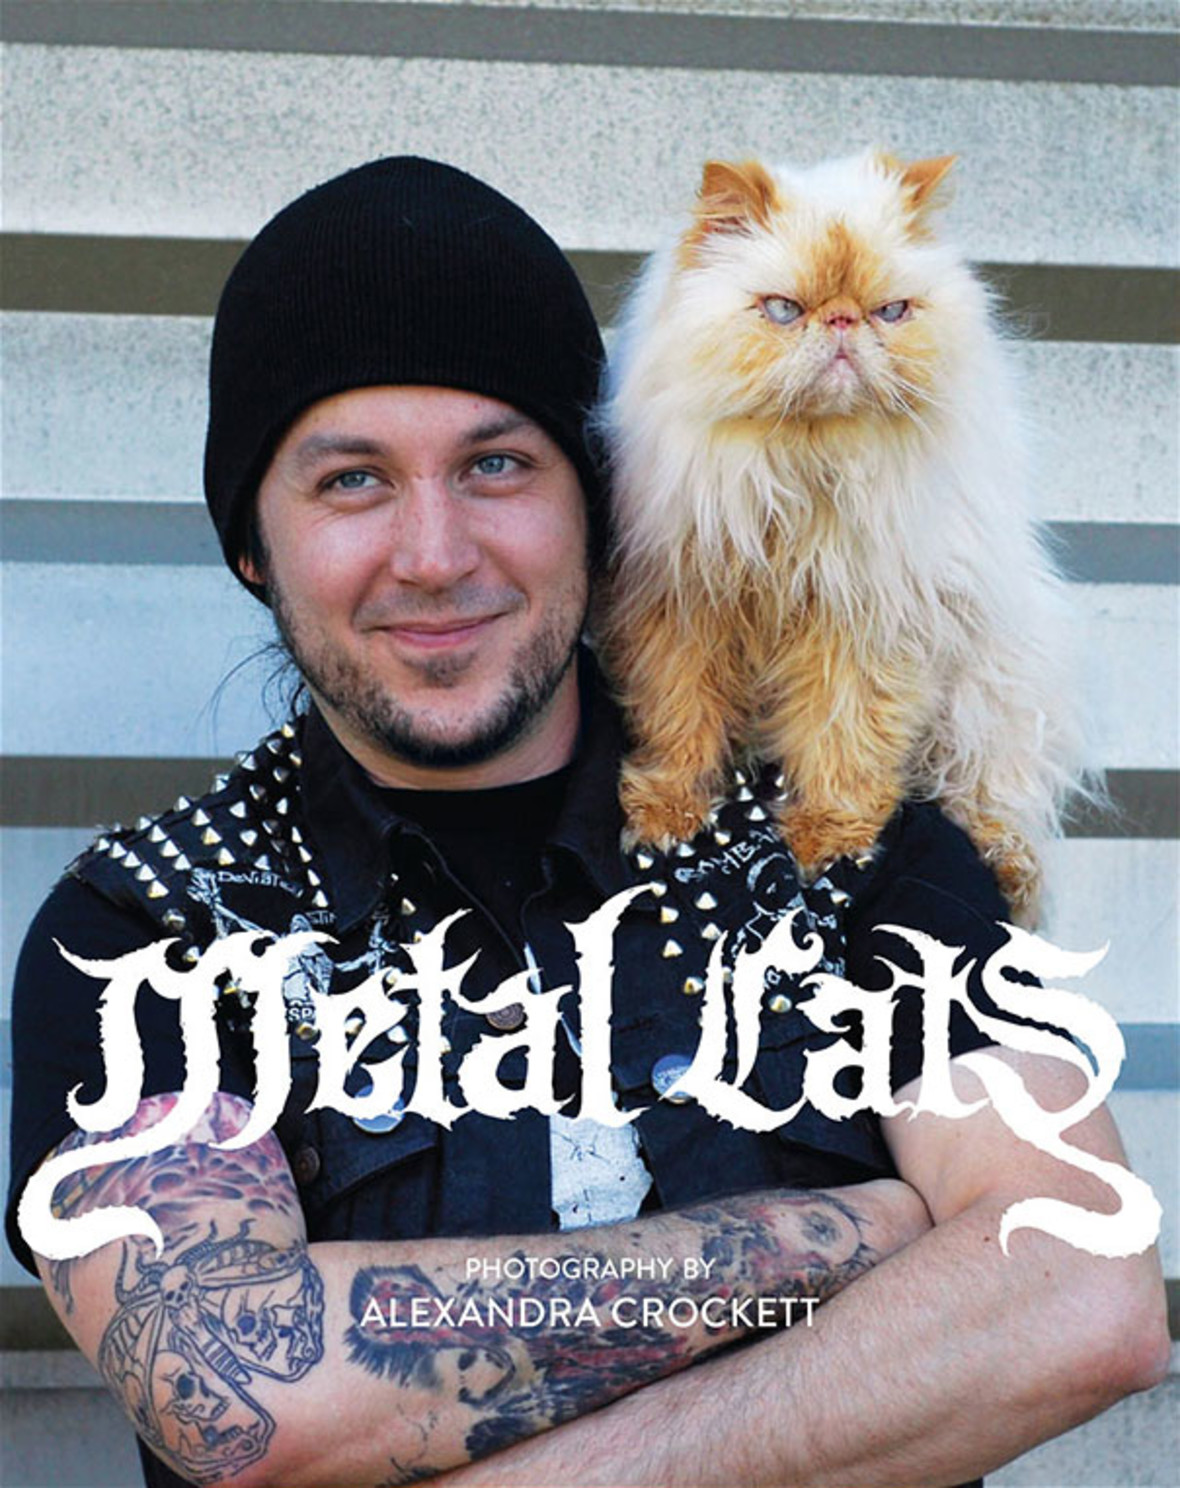 Każdy metal kocha kotki!